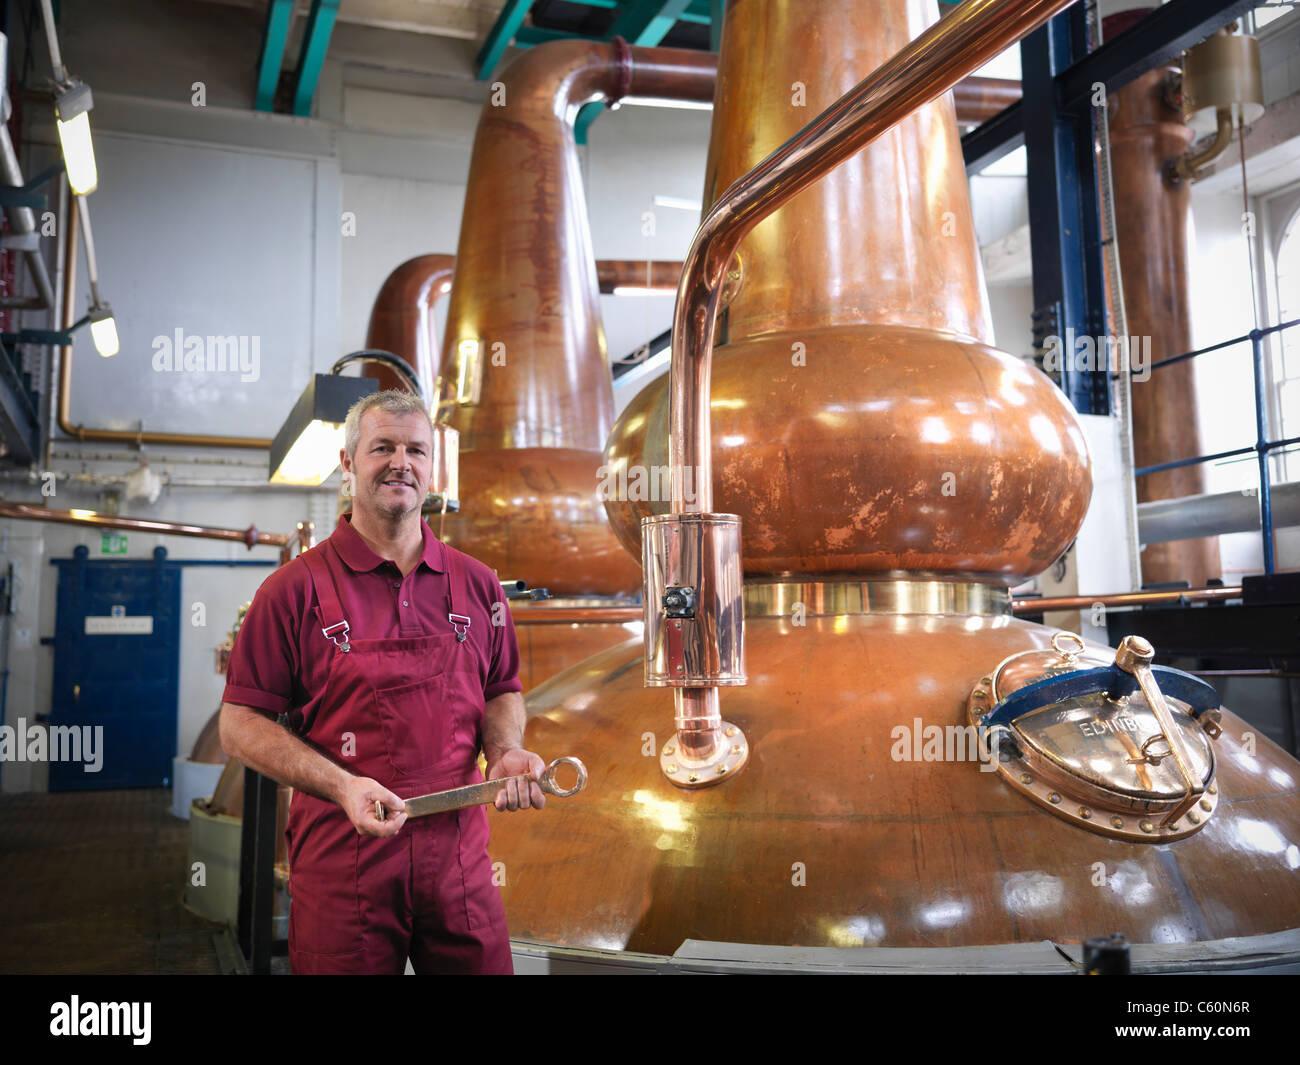 Worker with stills in distillery - Stock Image